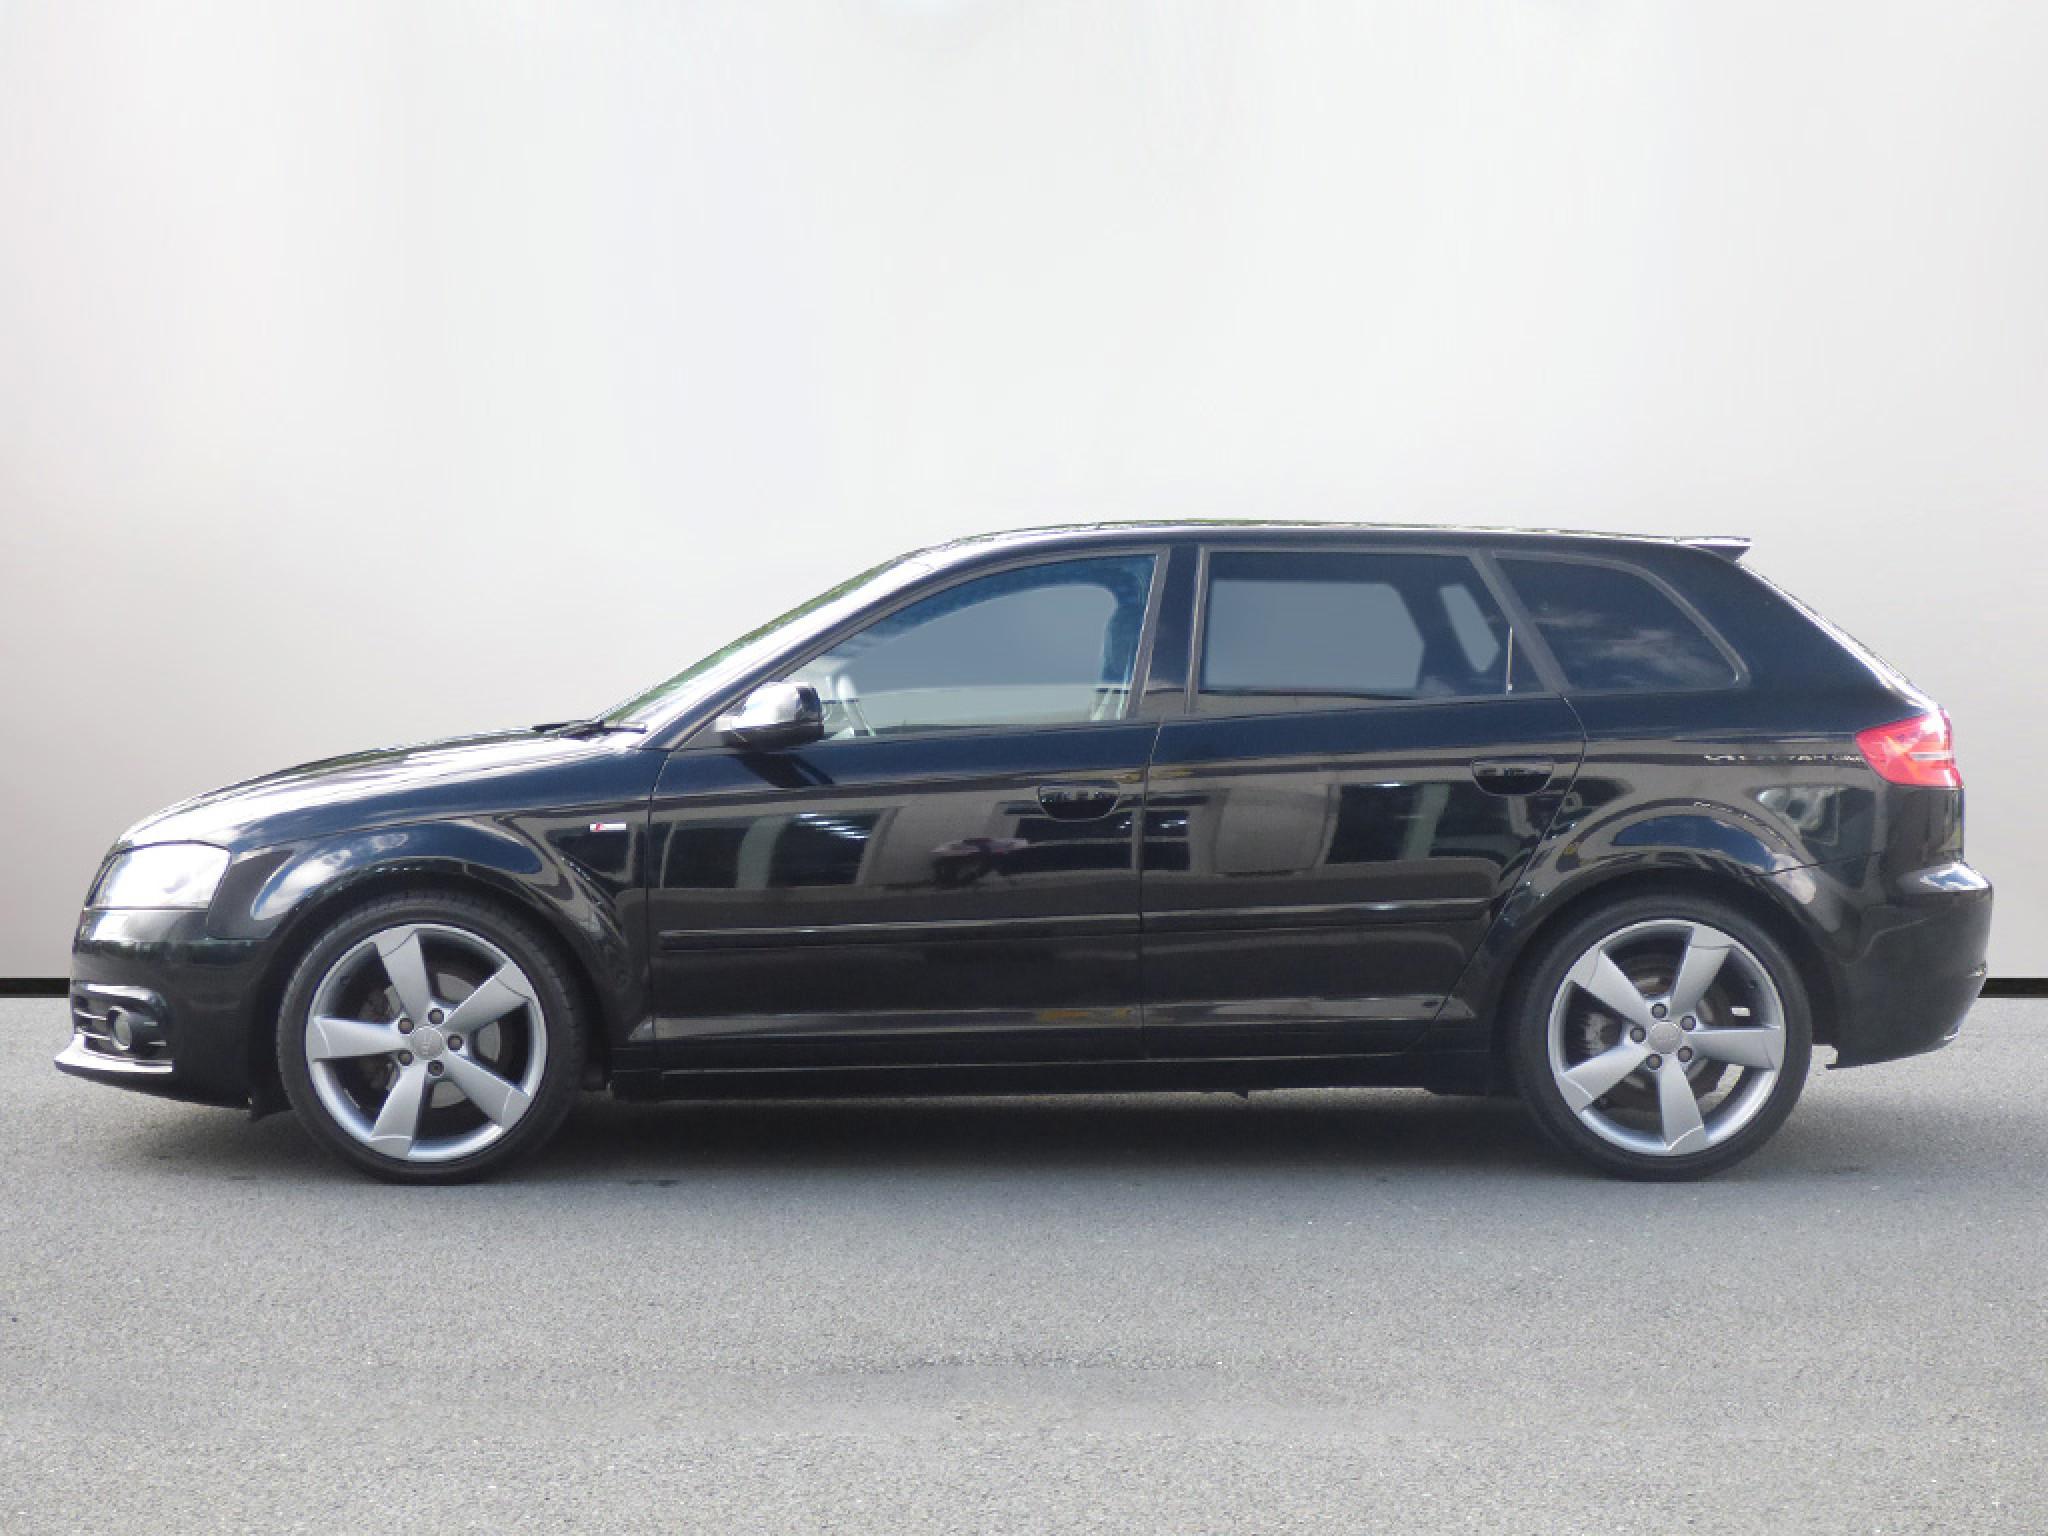 Audi A3 A3 2 0 TDI Black Edition 5dr [Start Stop]